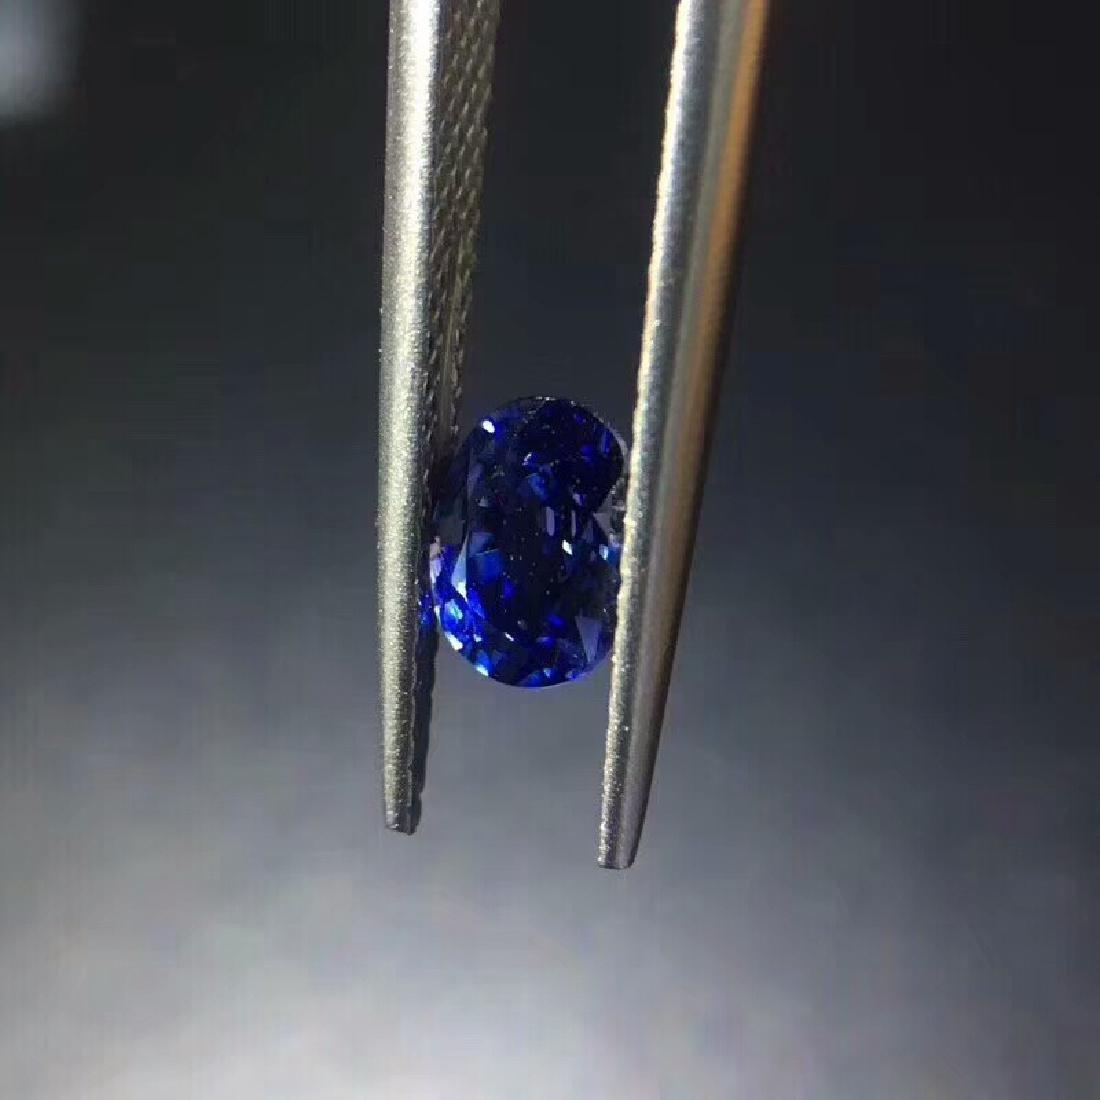 1.02 ct Sapphire 4.8*6.5*3.7 mm Oval Cut - 4